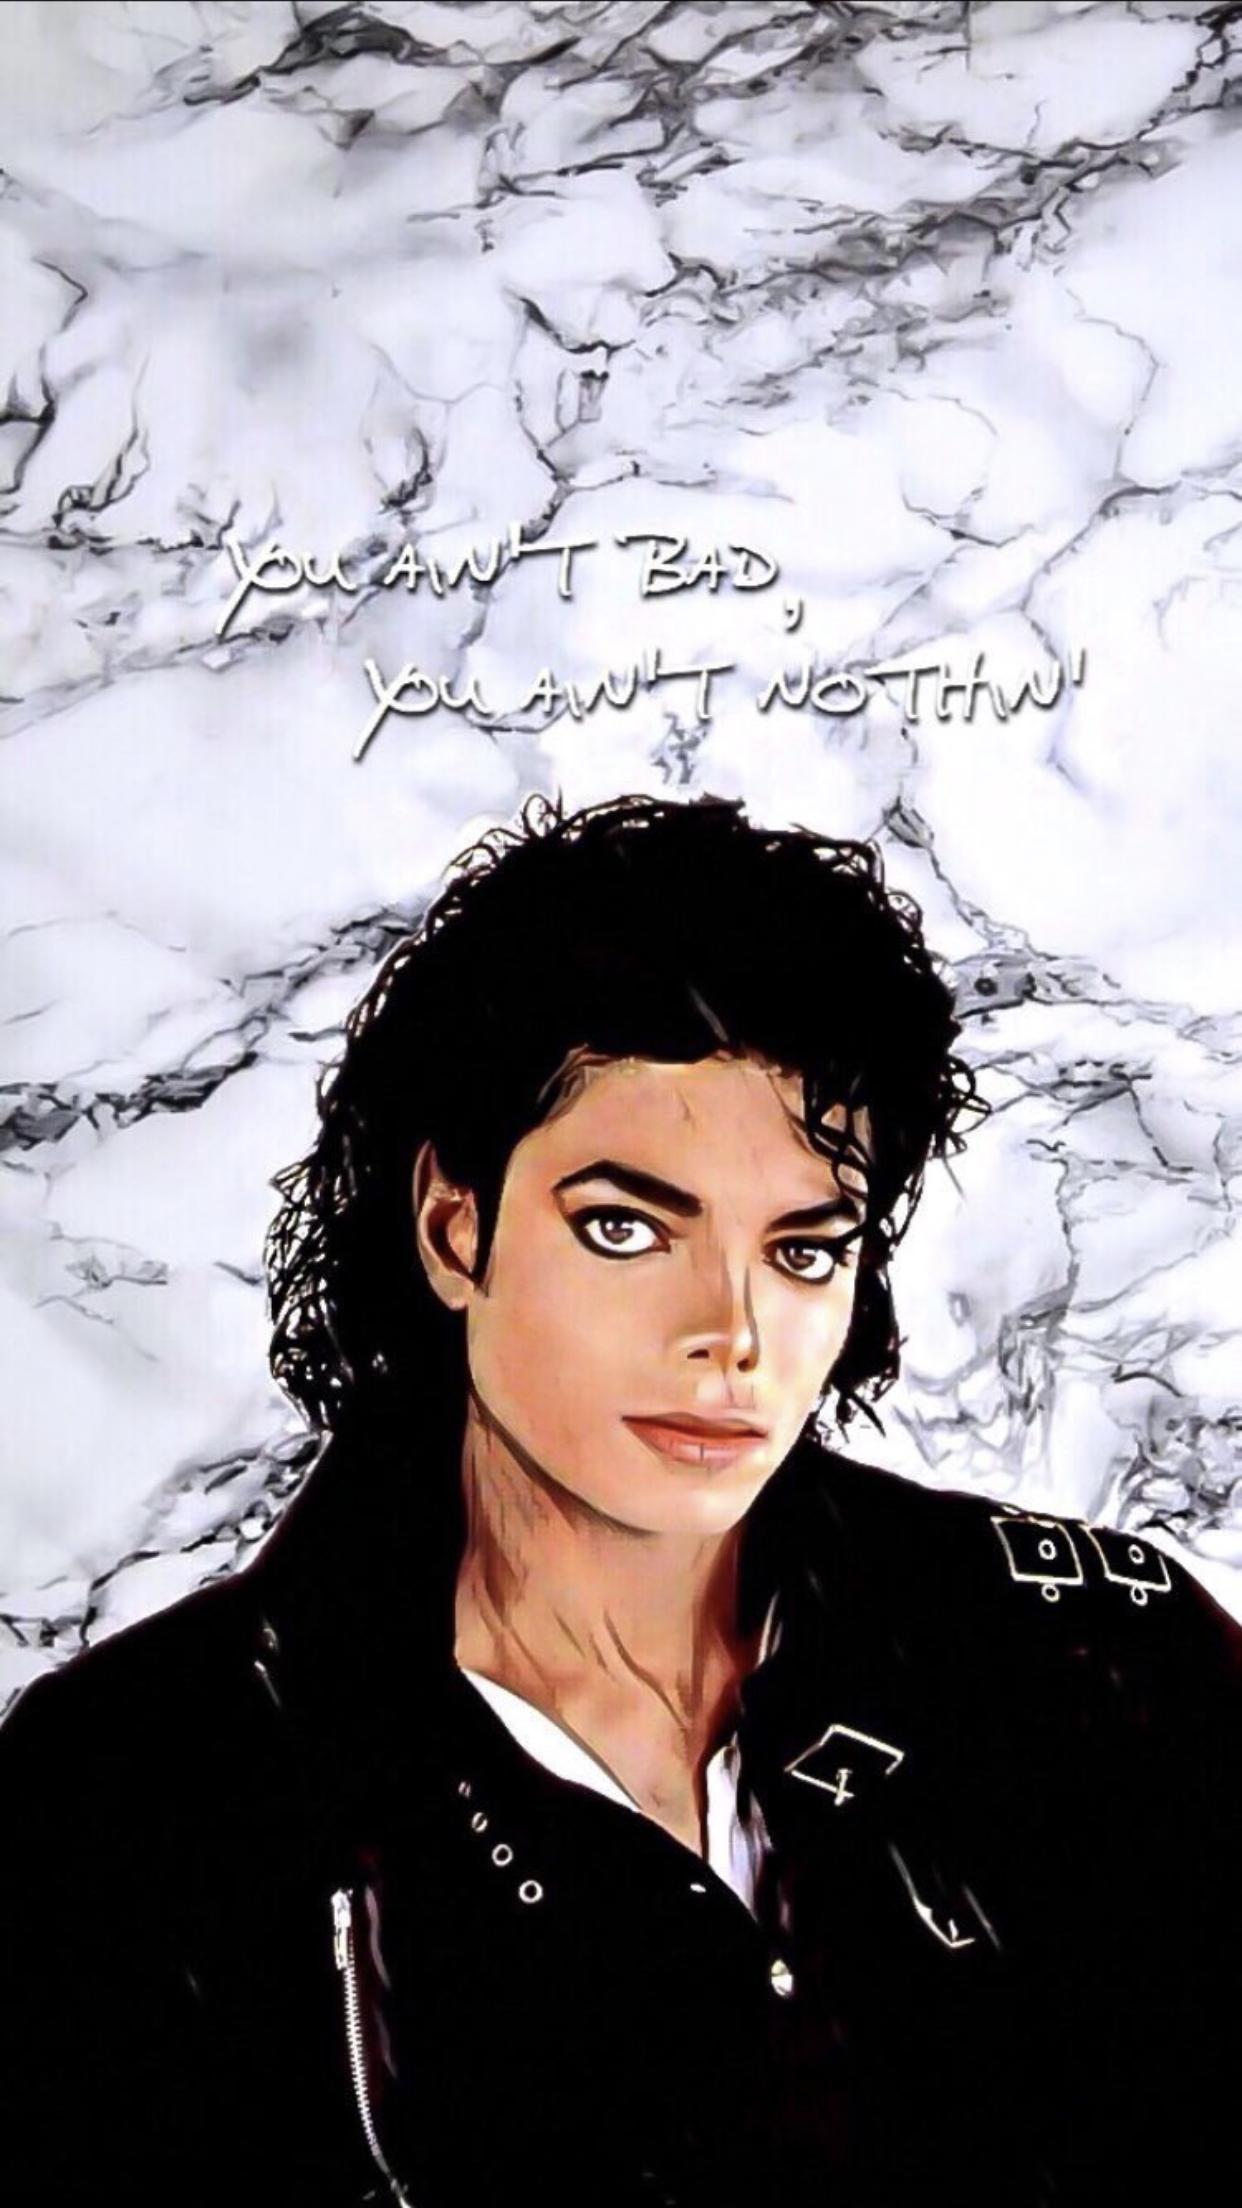 Bad Wallpaper Michael Jackson Michael Jackson Wallpaper Michael Jackson Smile Michael Jackson